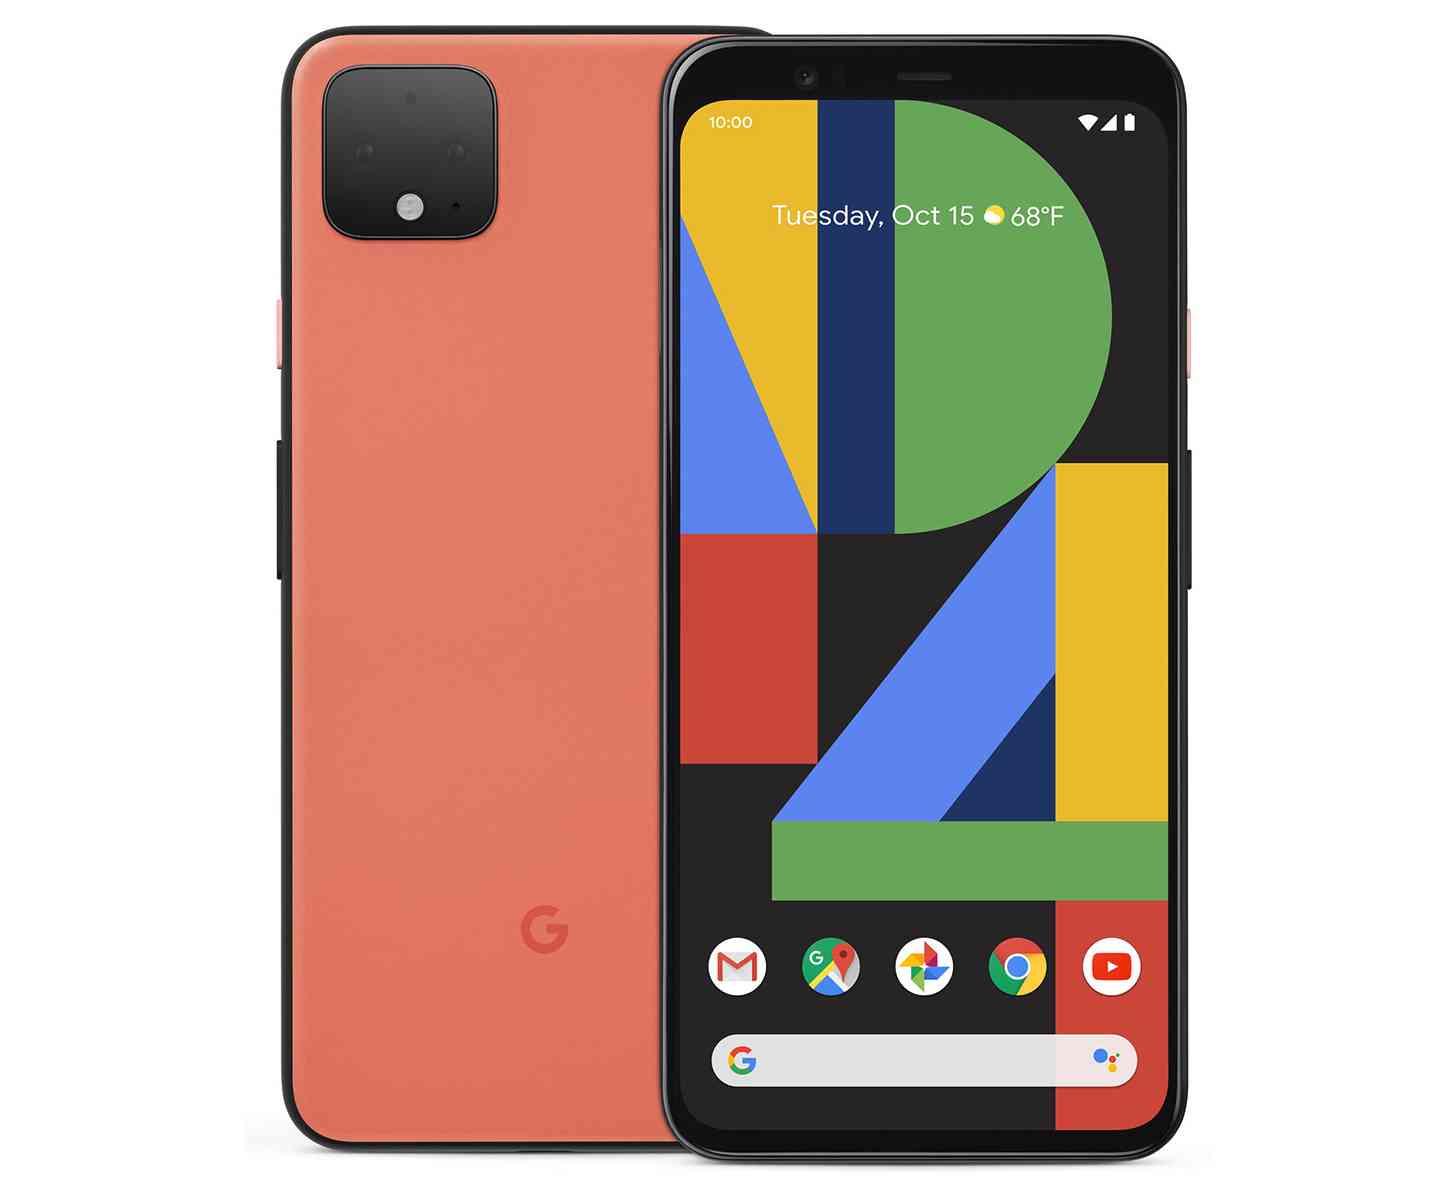 Google Pixel 4 in orange